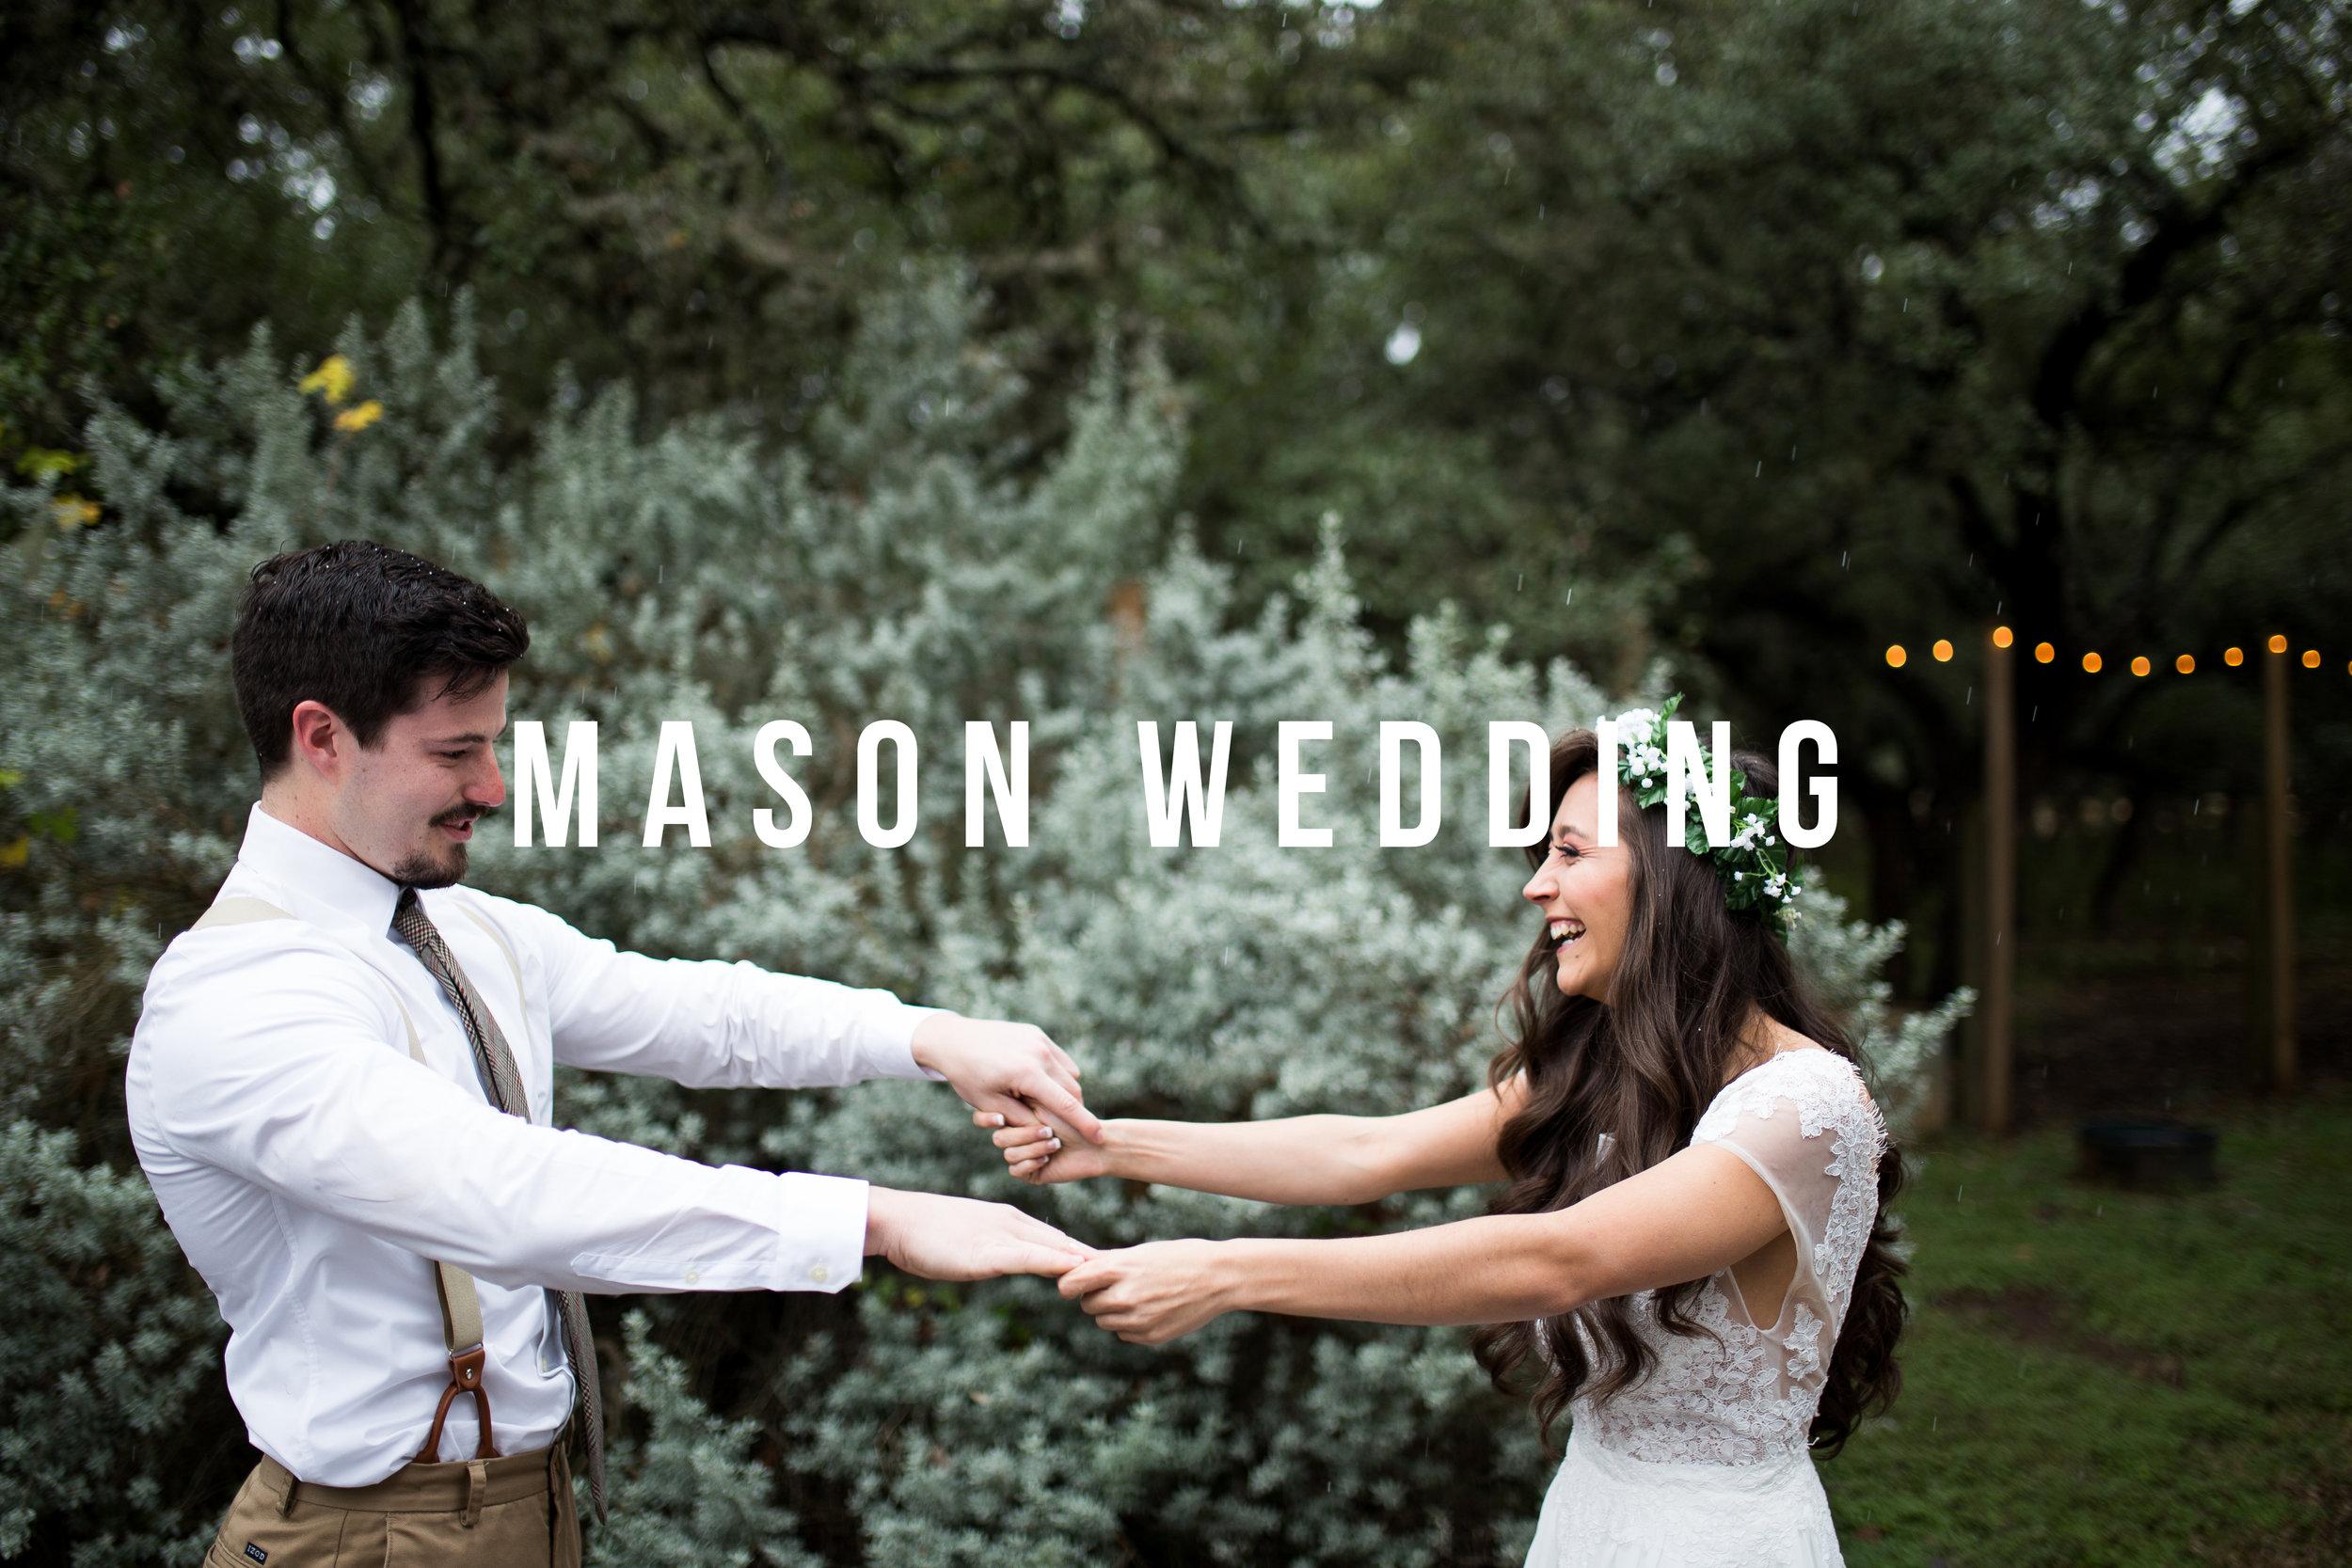 mason-wedding-austin-texas-wedding-new-york-city-wedding-photographer-stephanie-hanson-photo